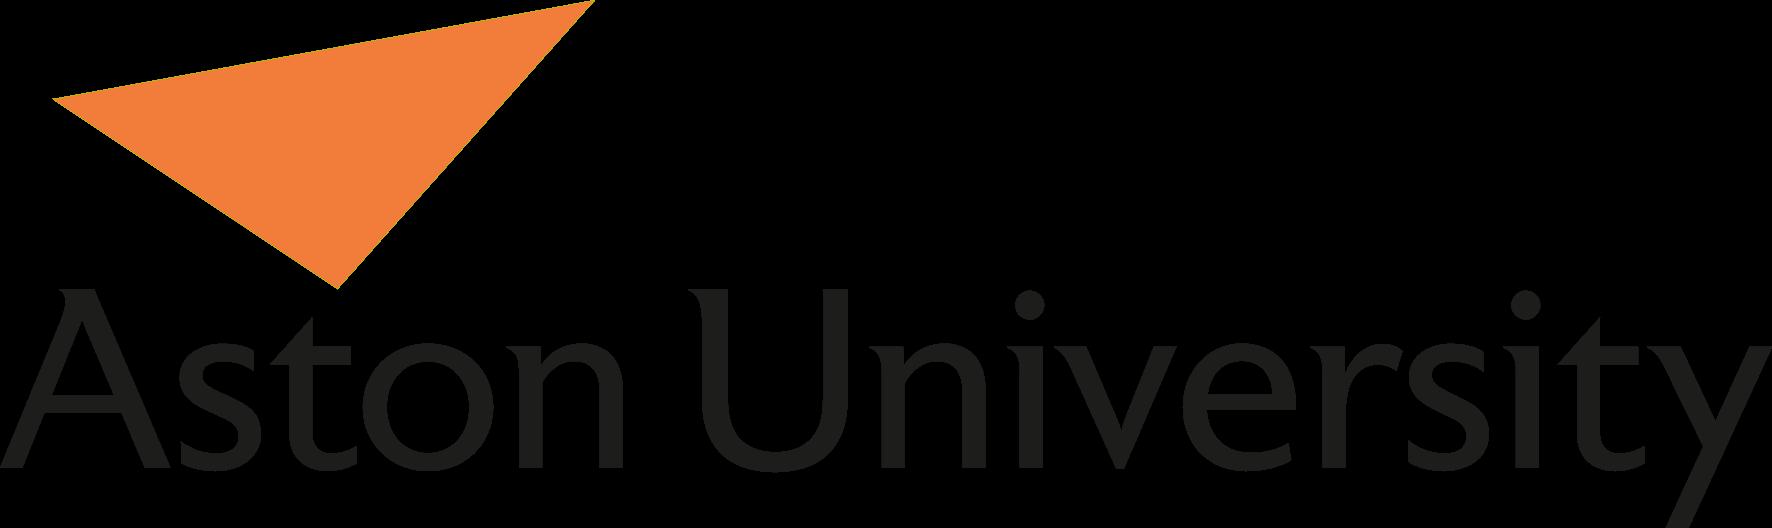 aston-university-png.png